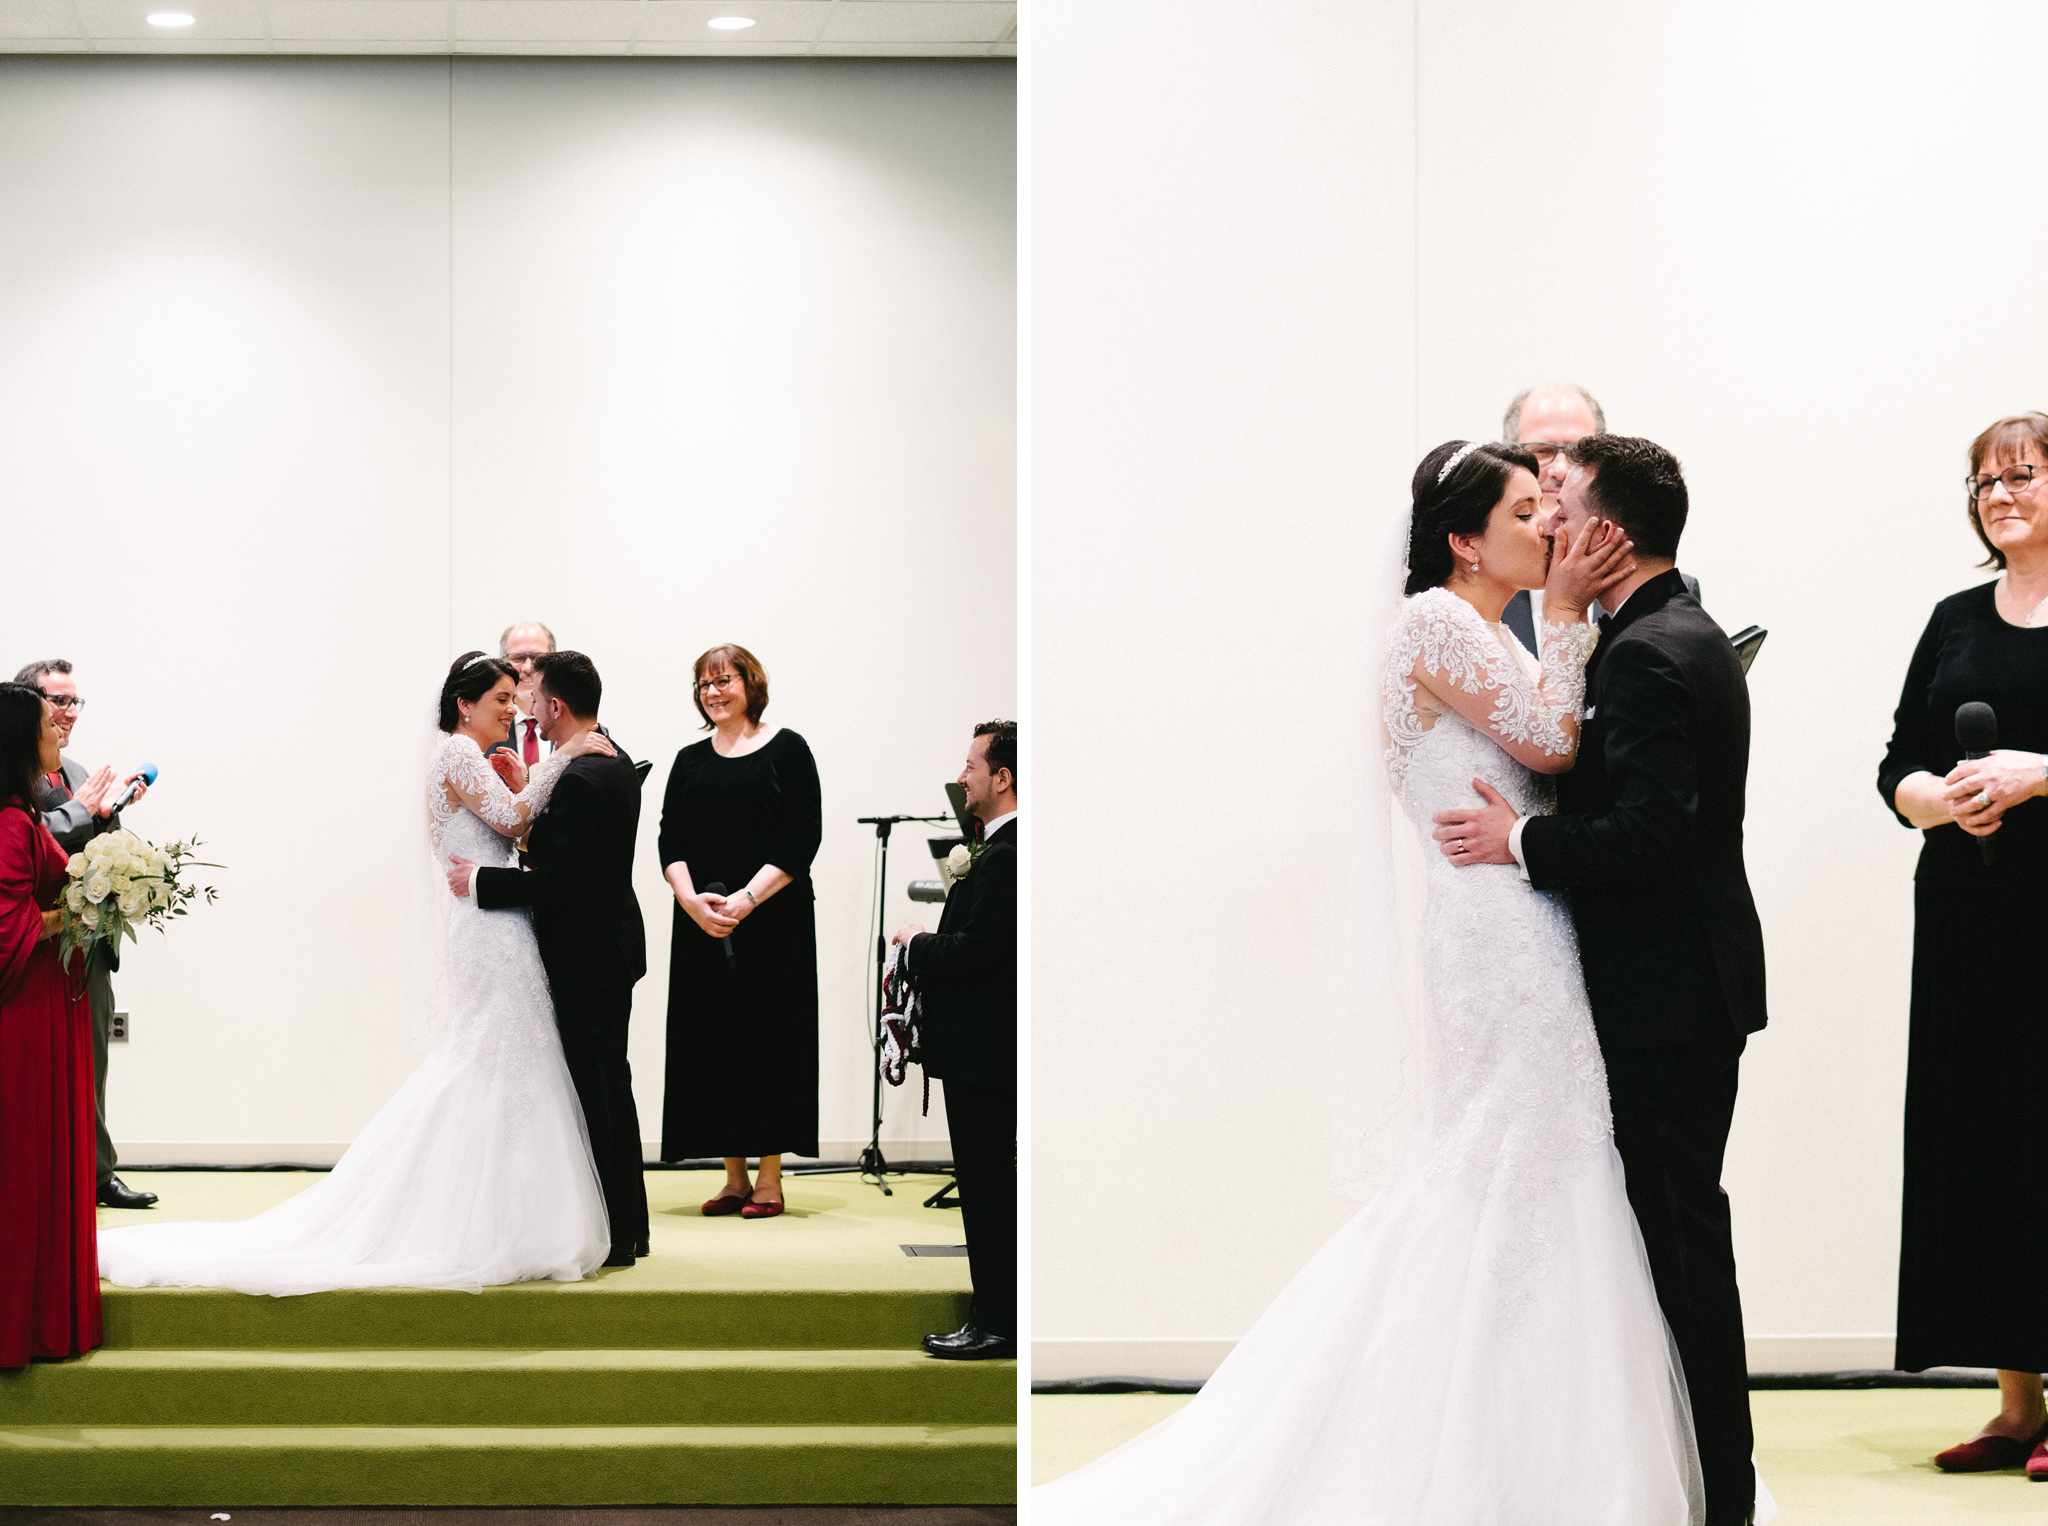 016-rempel-photography-chicago-wedding-inspiration-susan-daniel-michigan-metro-detroit-christian-church-holly-vault-cupcakes-and-kisses.jpg